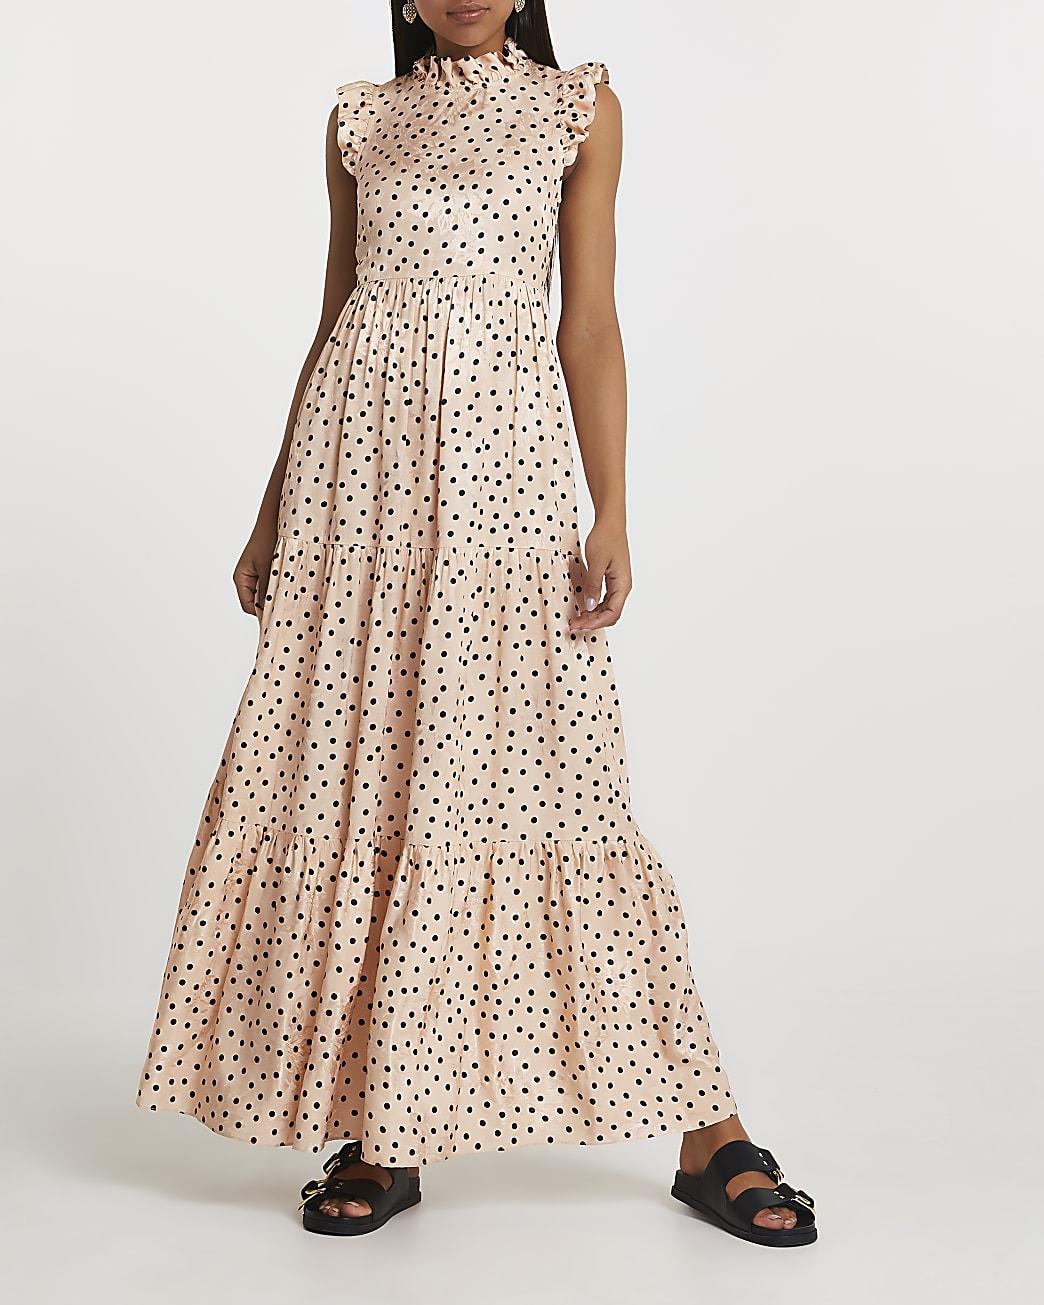 Cream polka dot maxi dress